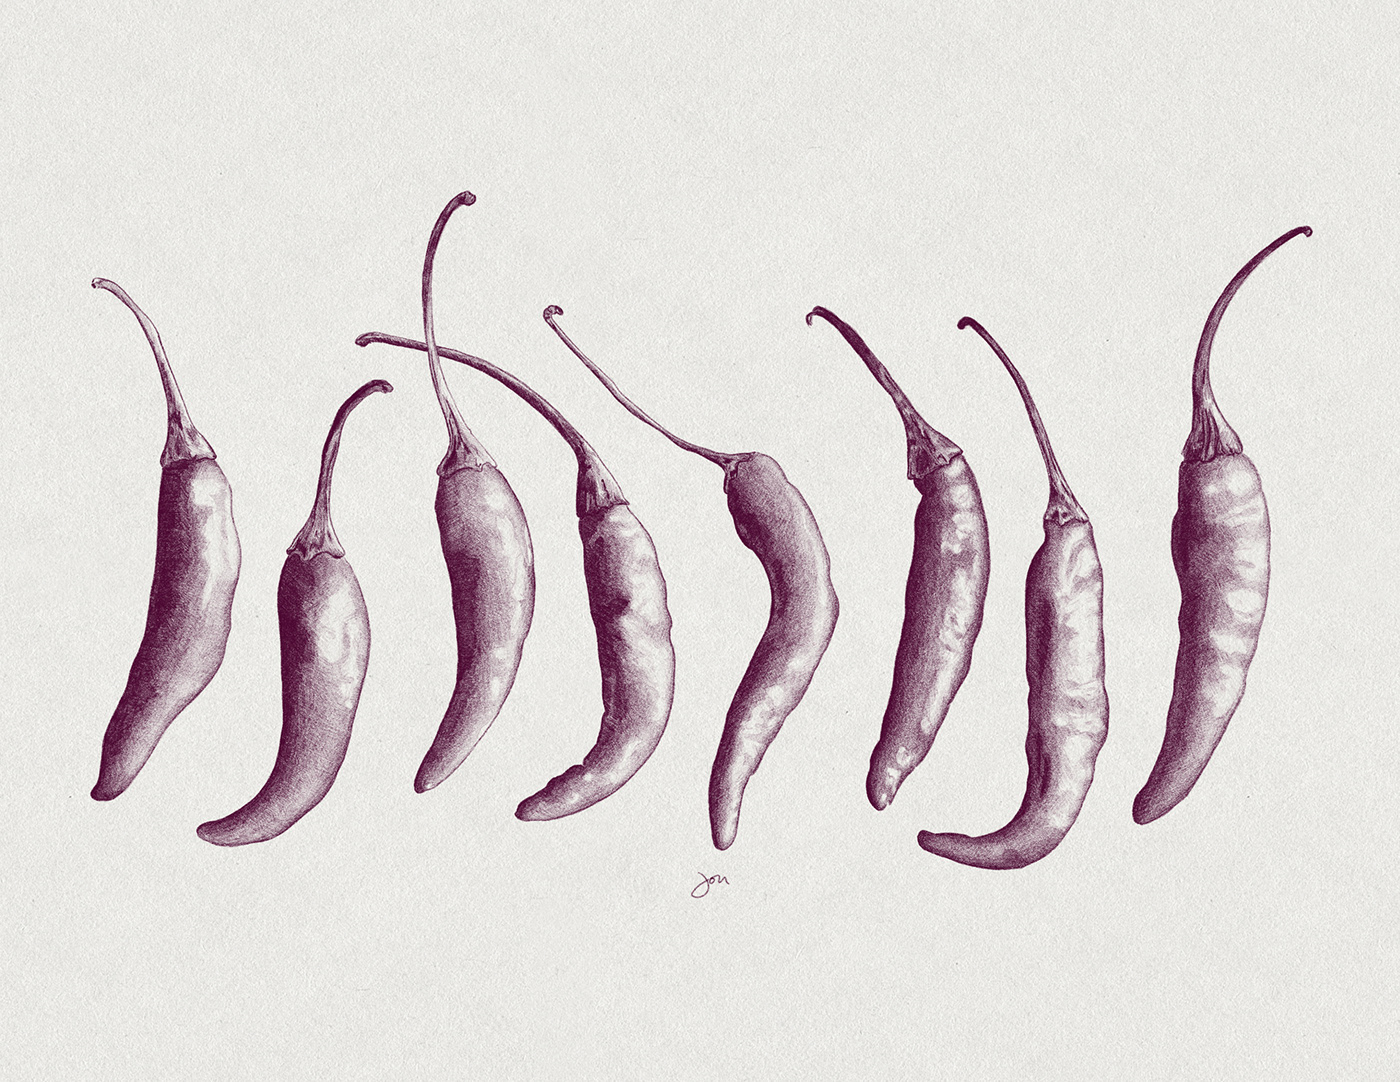 adobe fresco Chili Peppers Digital Art  Drawing  ipad pro sketch